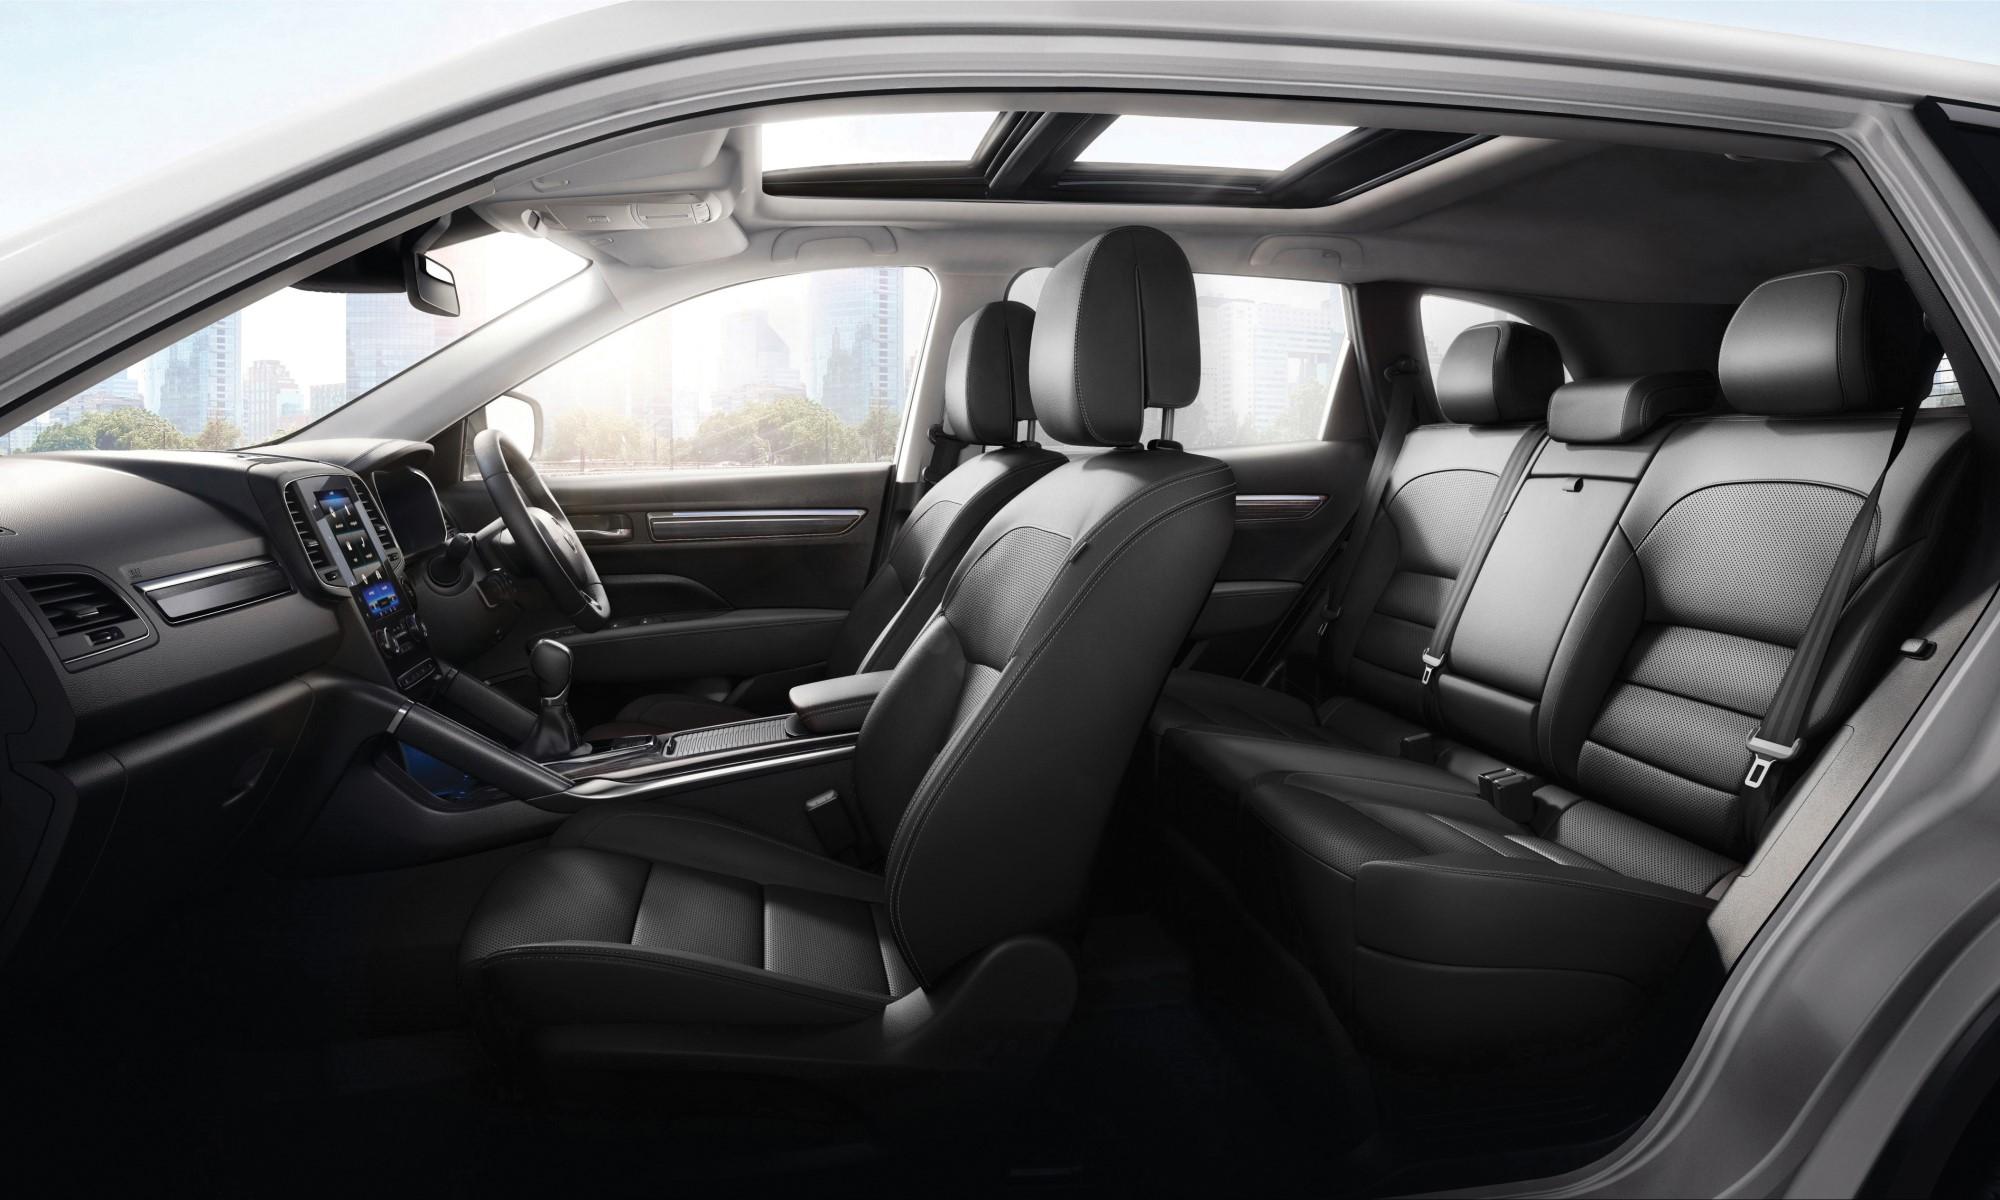 Renault Koleos Dynamique CVT cabin